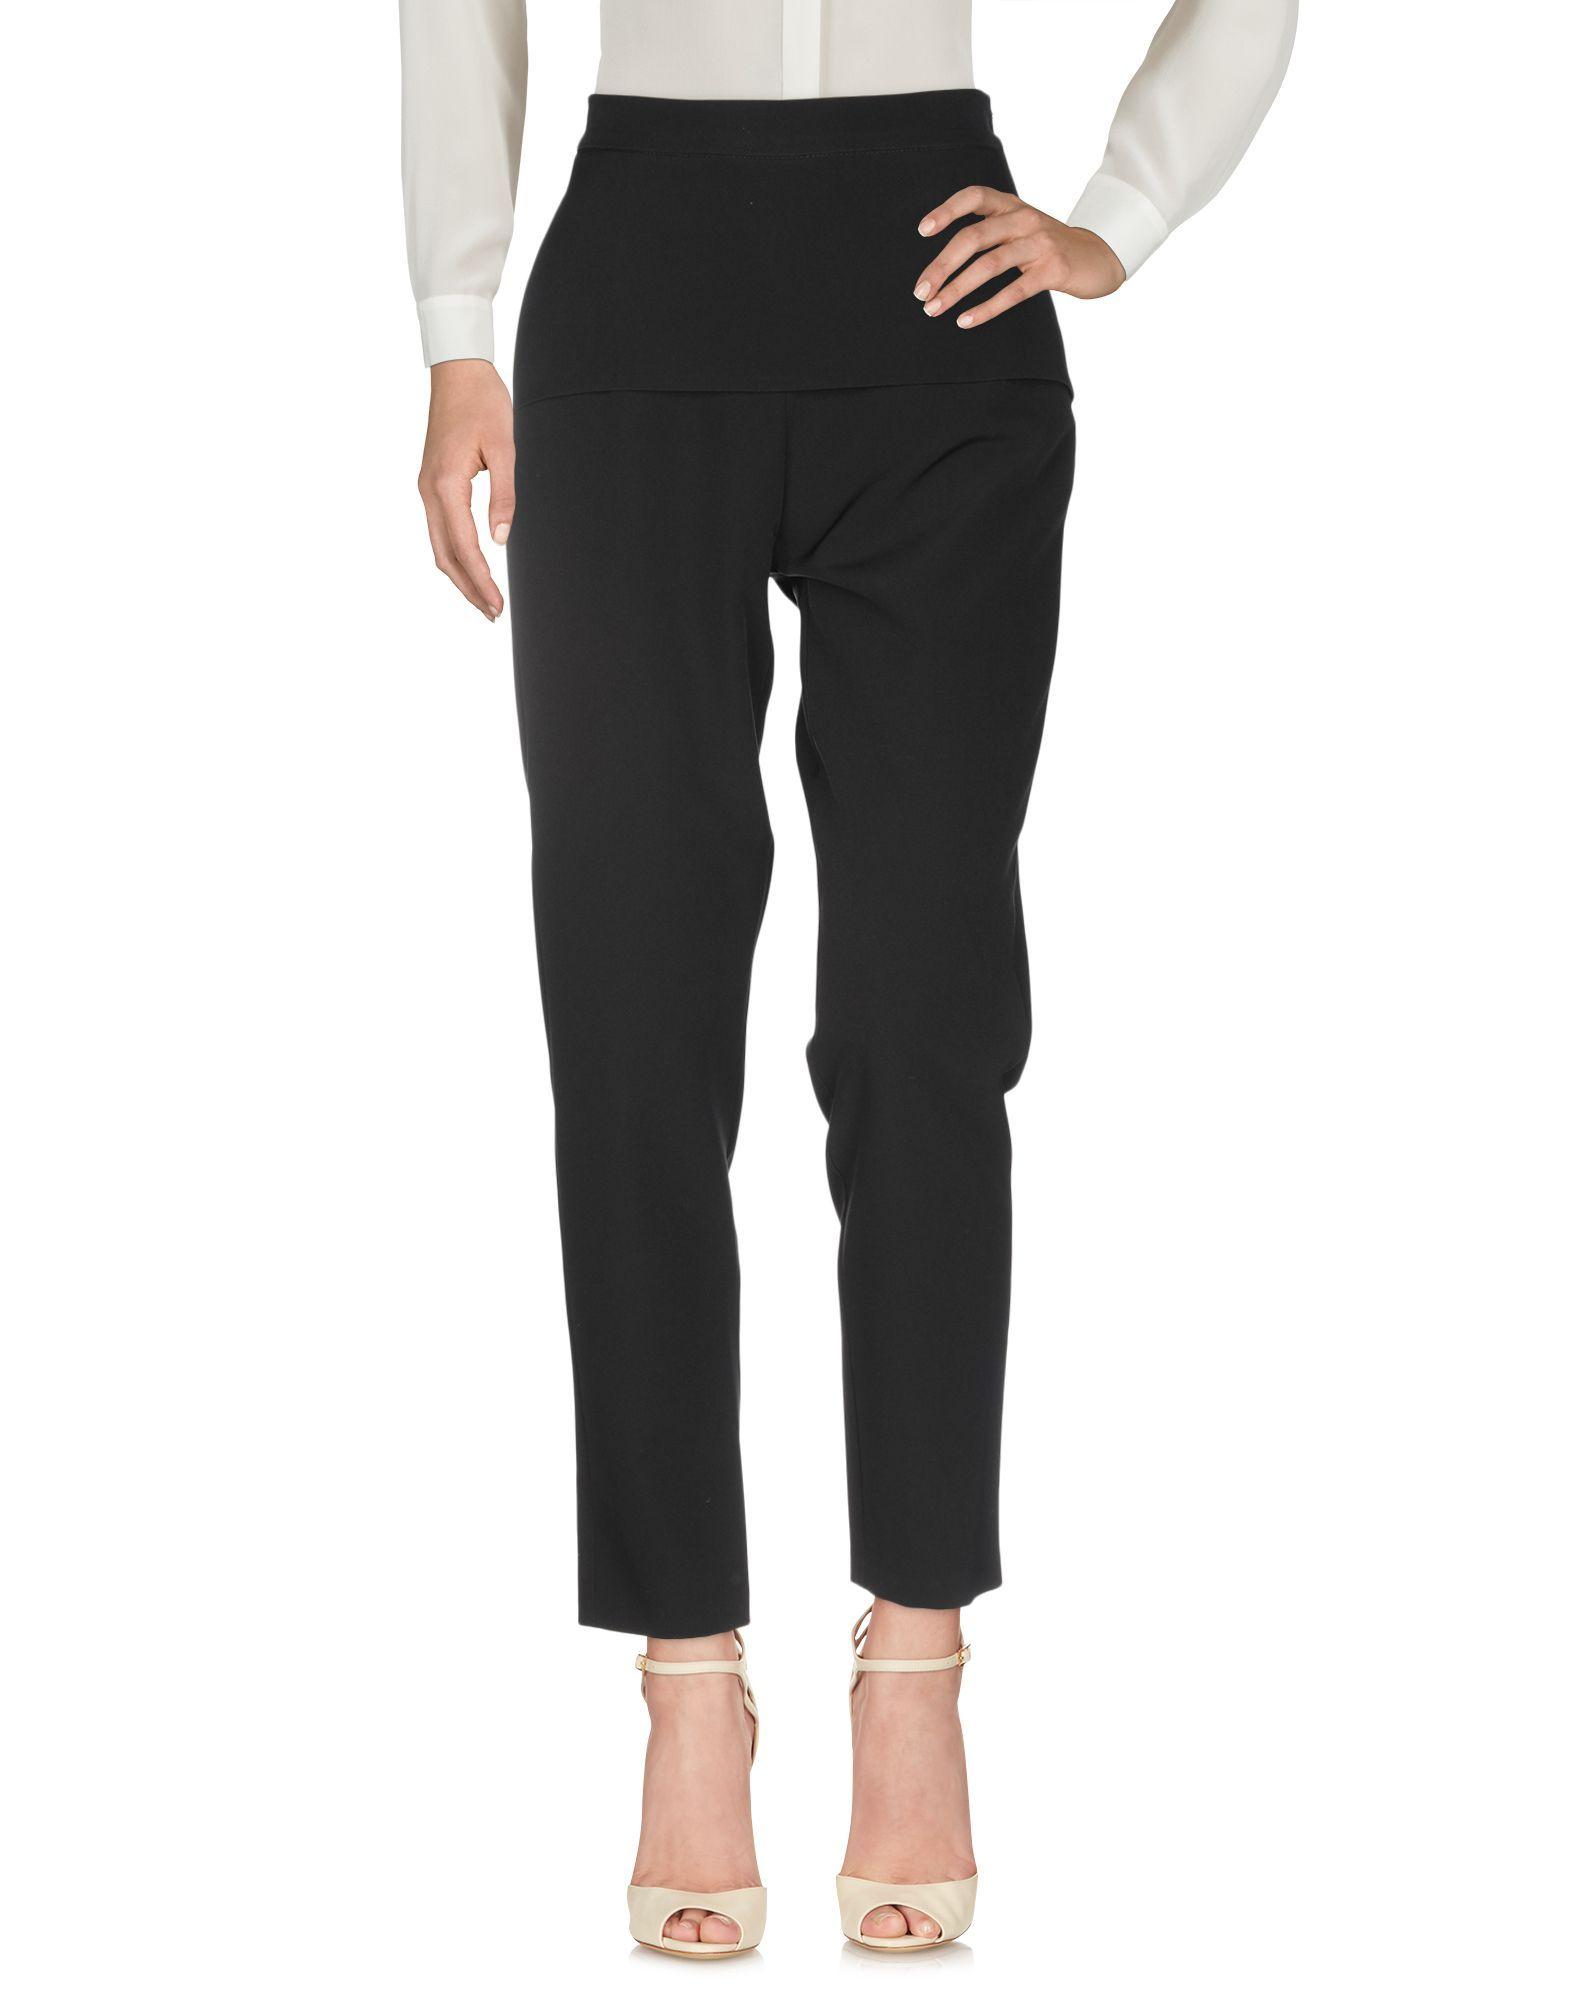 La Kore Black Tailored Trousers